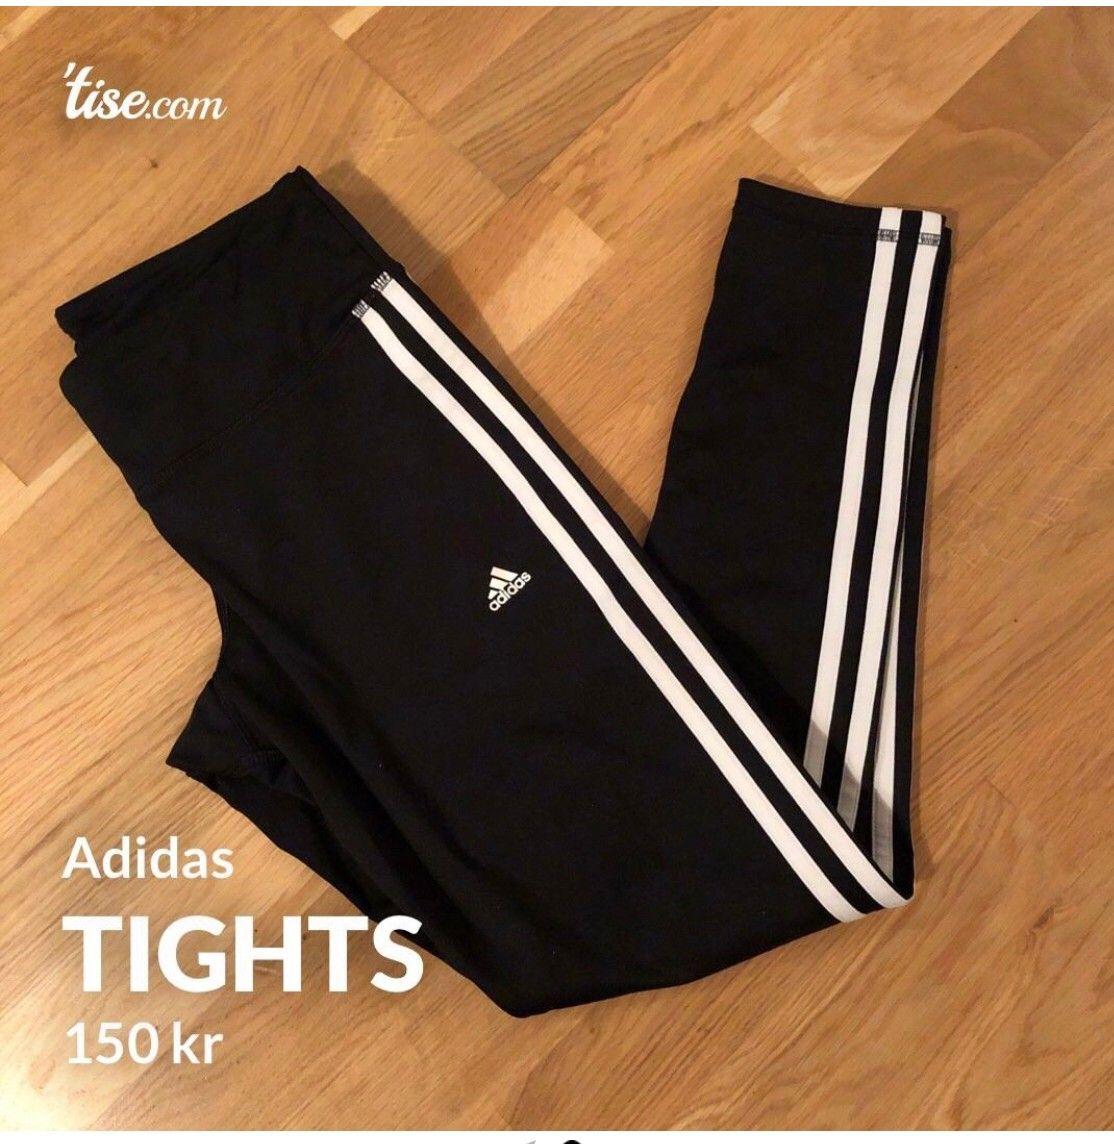 Adidas tights   FINN.no